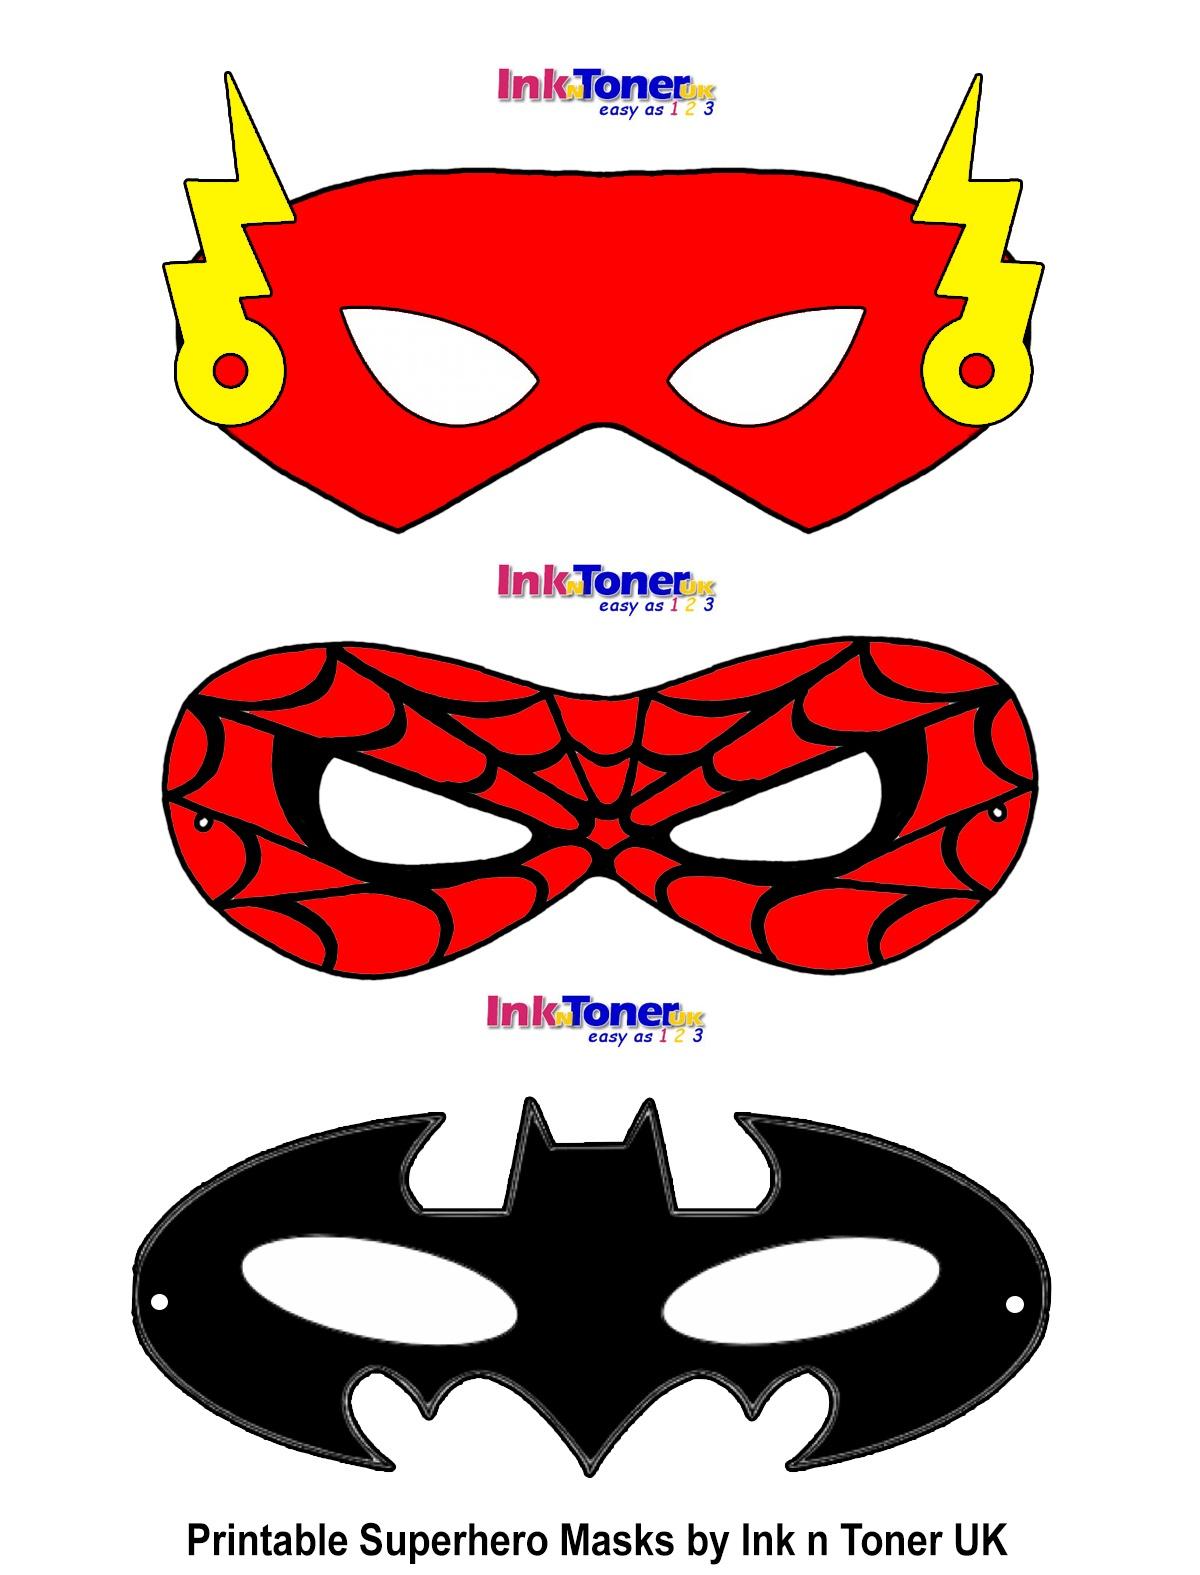 Printable Superhero Masks For Super Hero Day   Inkntoneruk Blog - Free Printable Superhero Masks